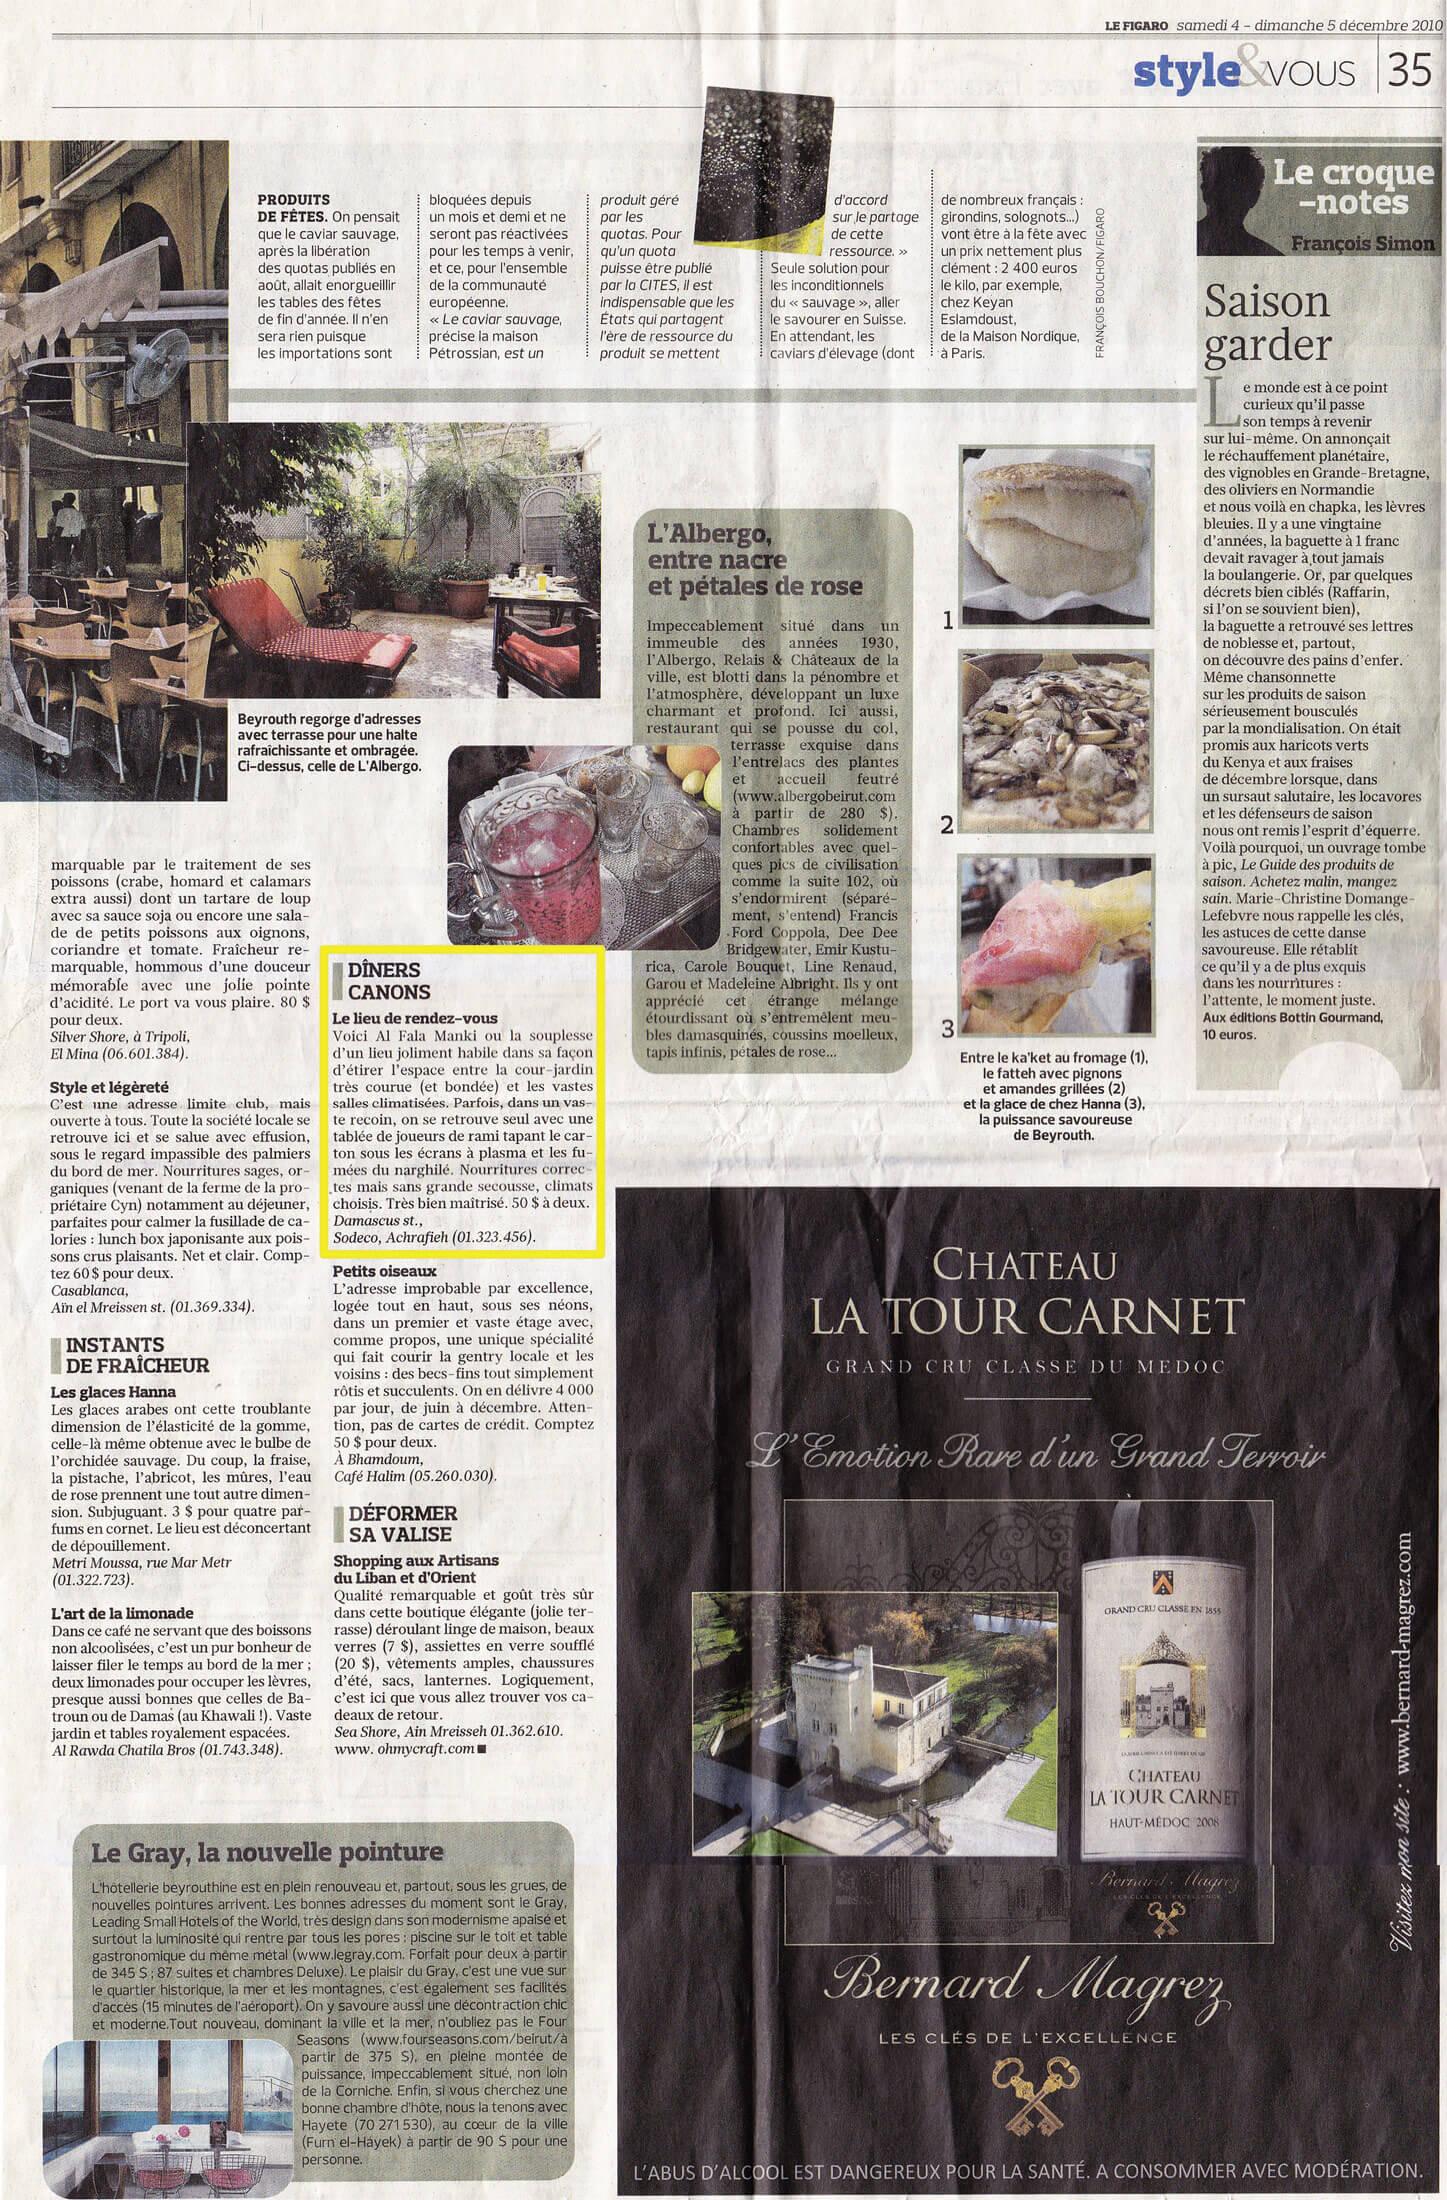 Le Figaro December 2010